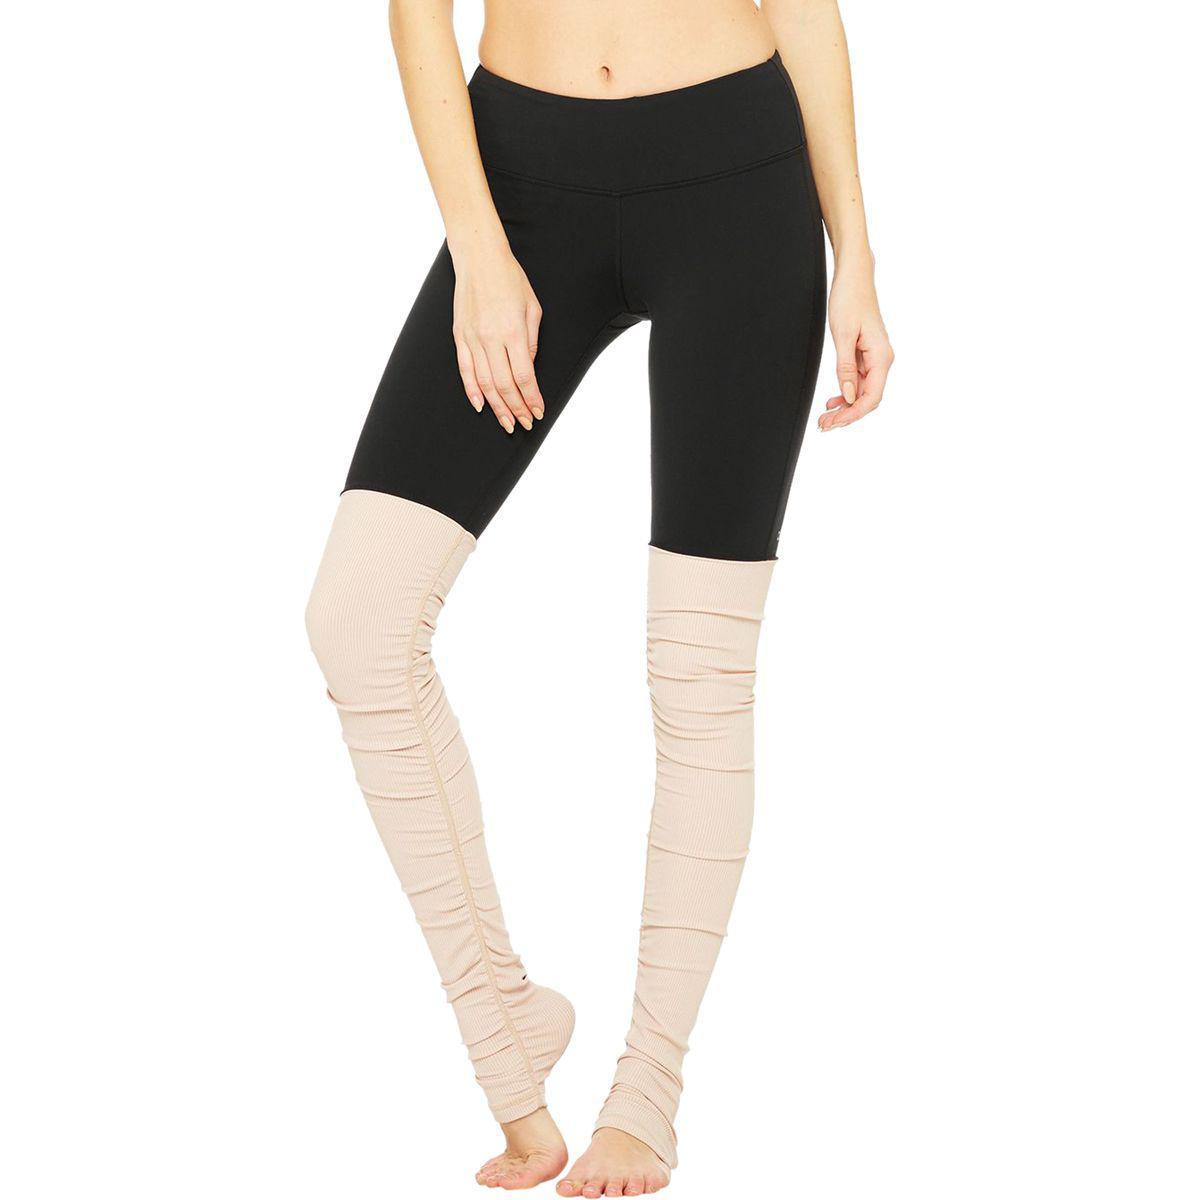 36ffa441d3 Lyst - Alo Yoga Goddess Ribbed Leggings in Black